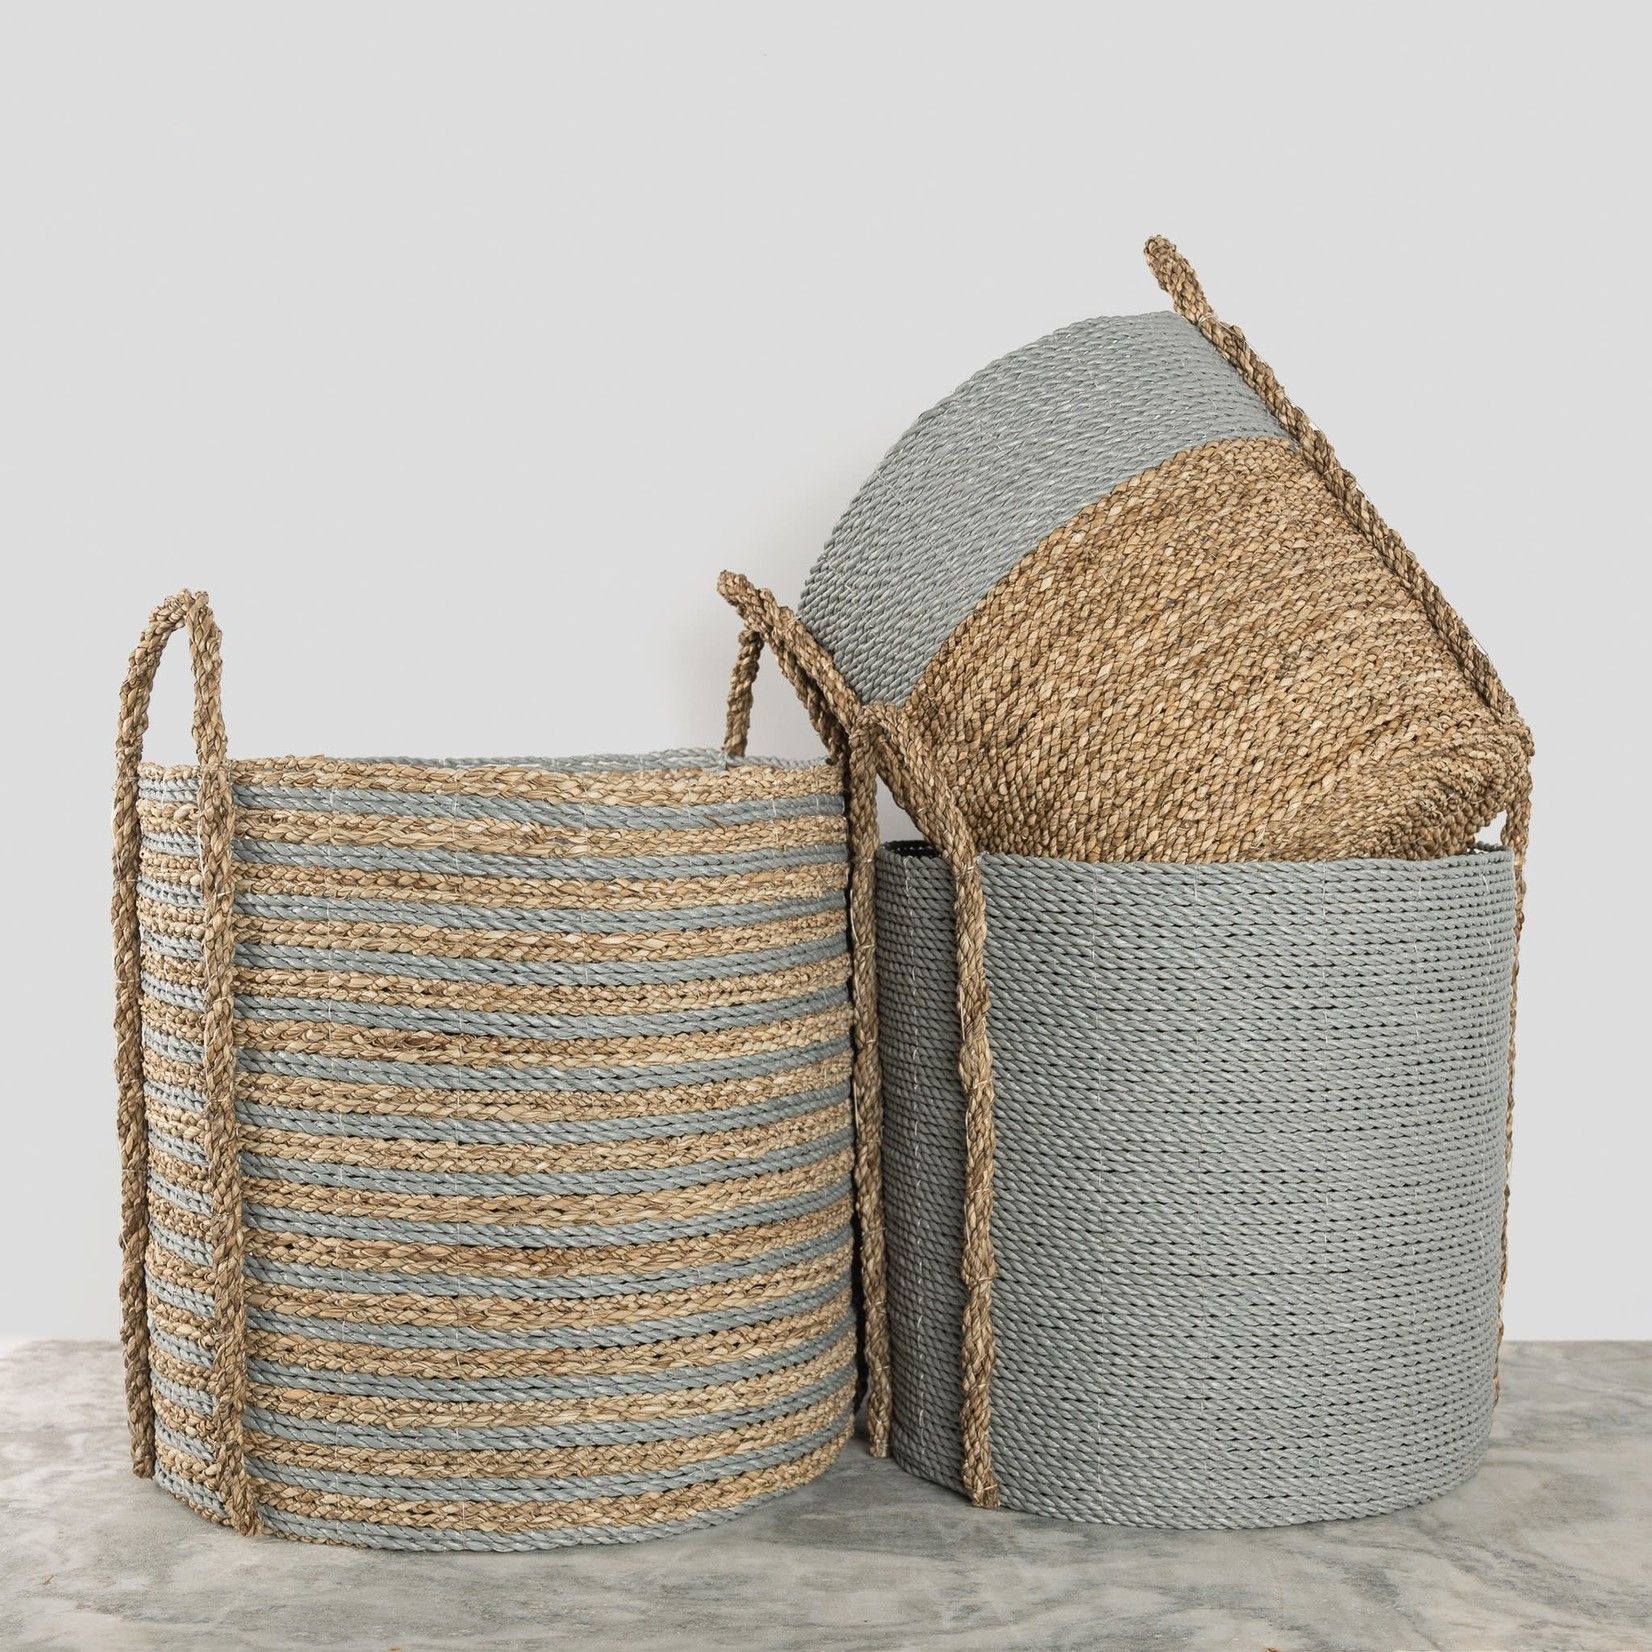 Pokoloko Handled Laundry Baskets